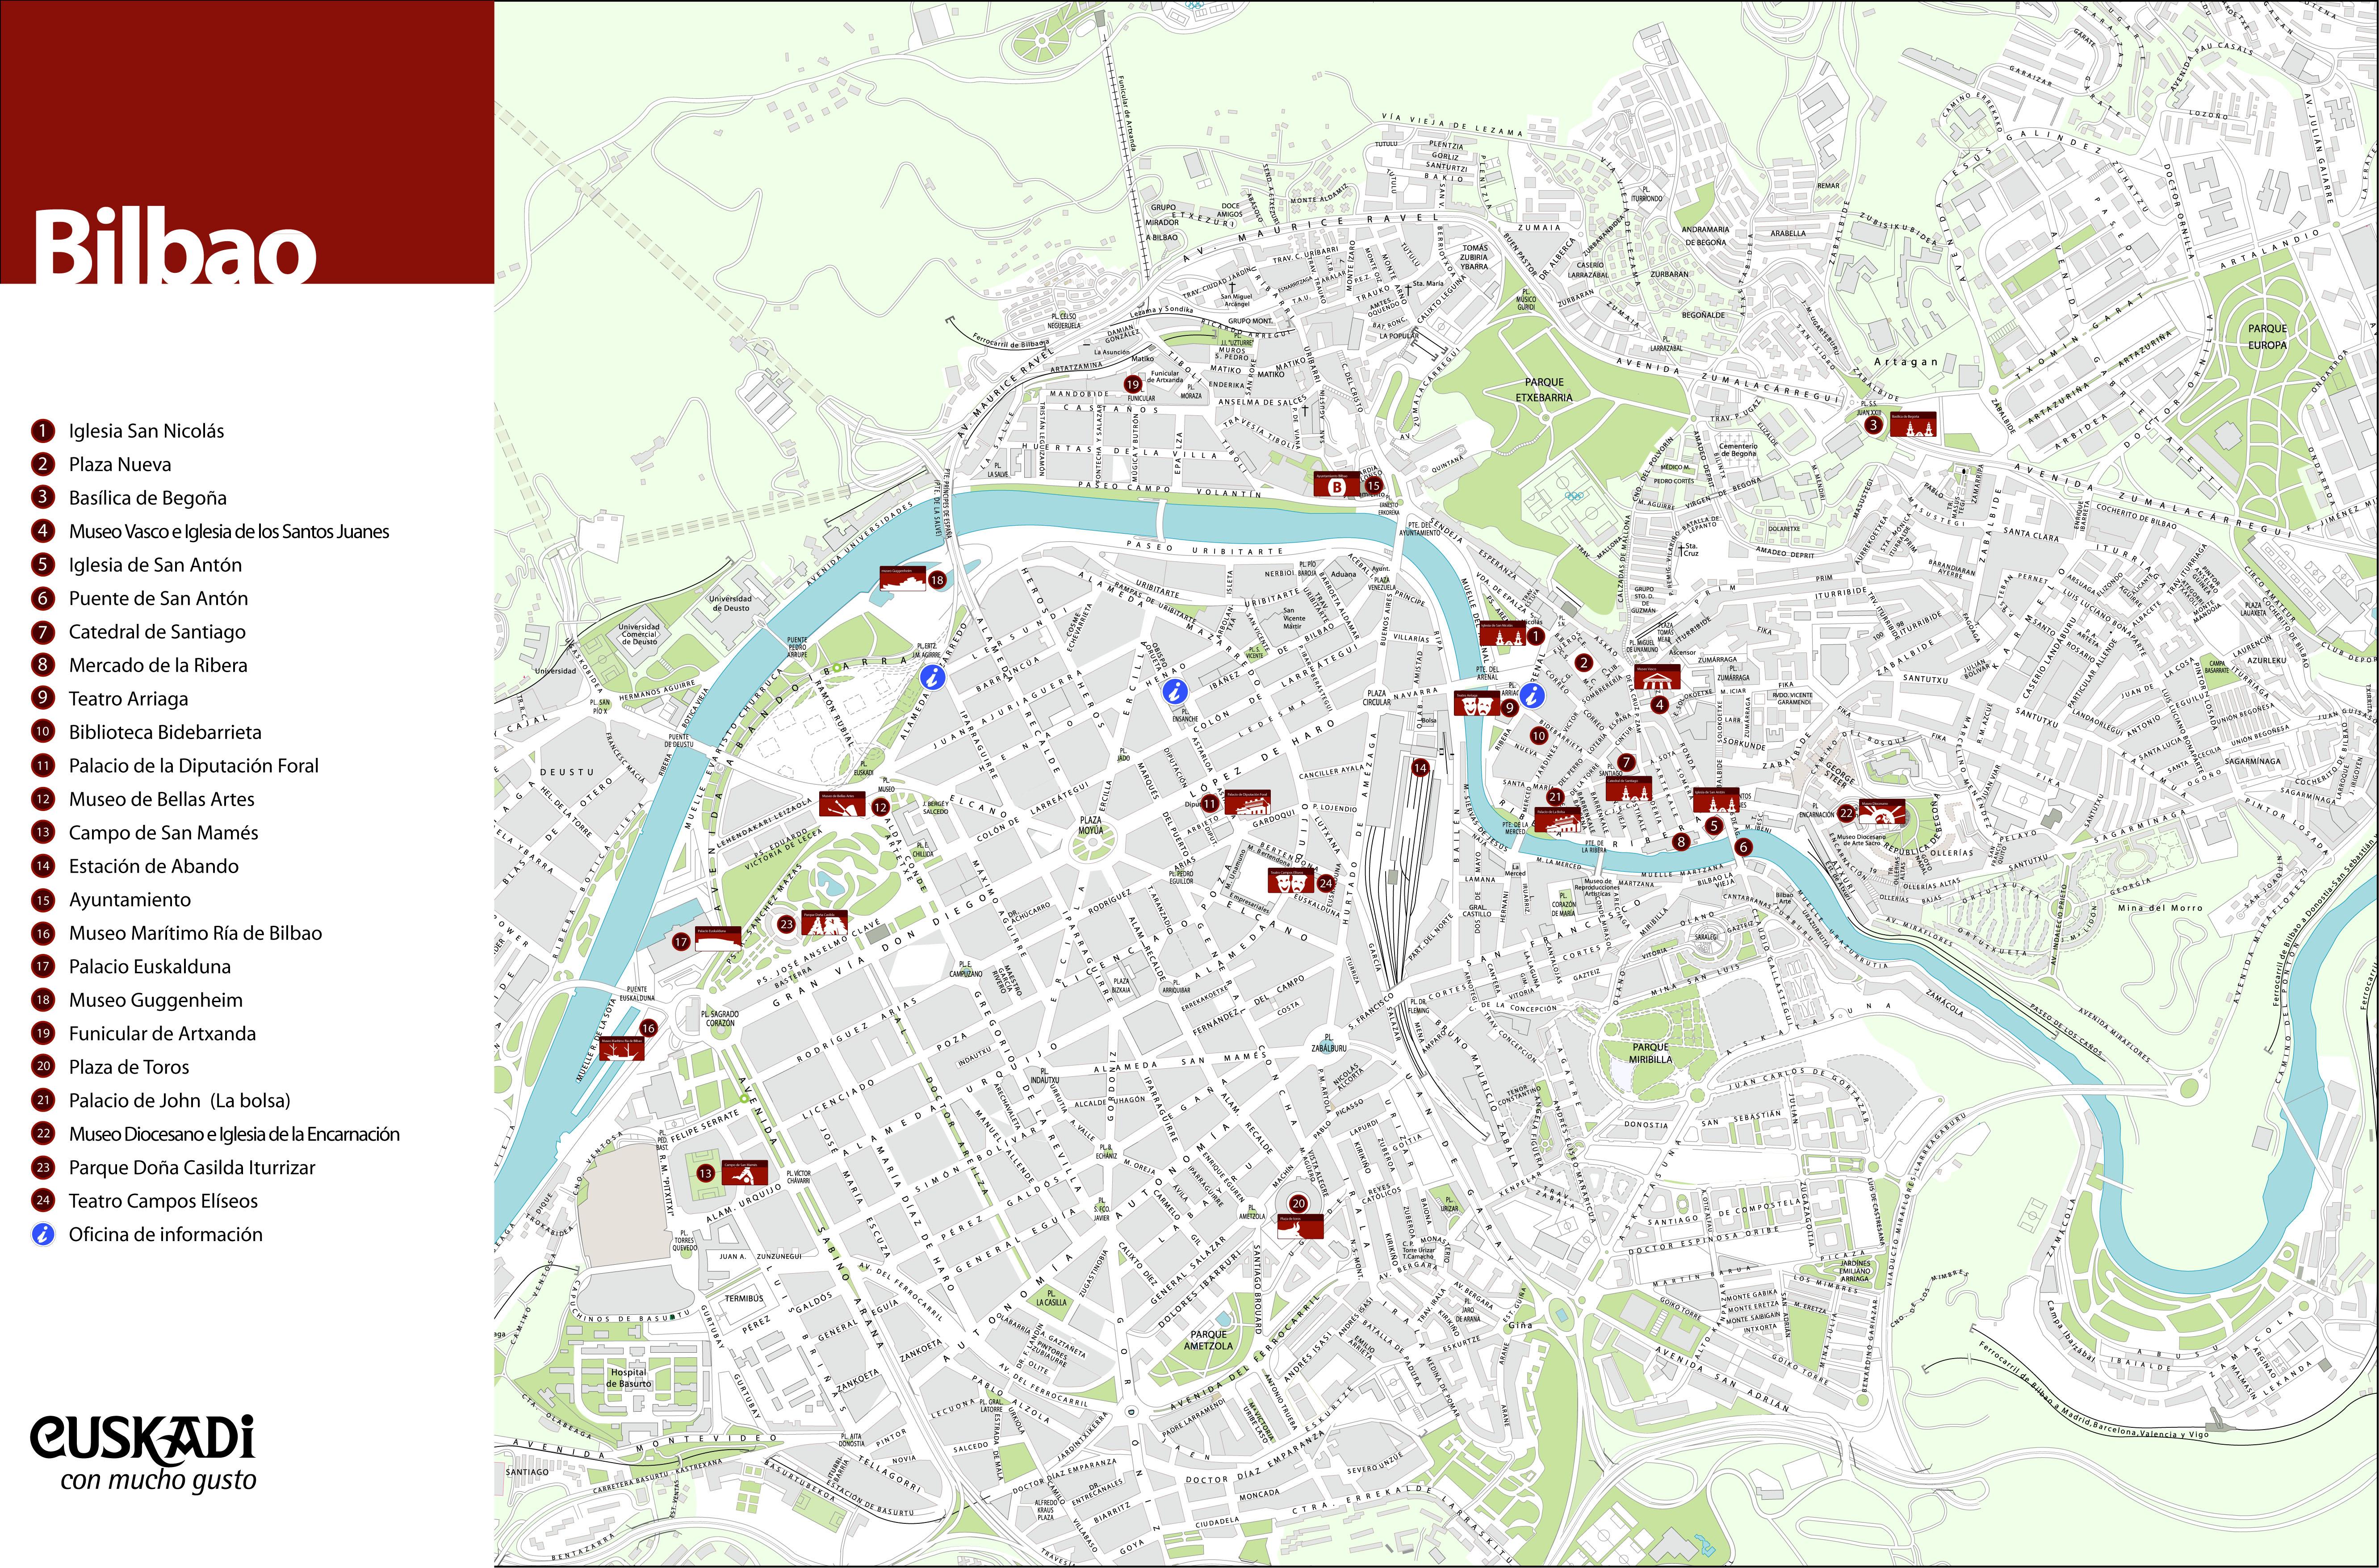 Bilbao Spain Map Tourist Bilbao Spain Map